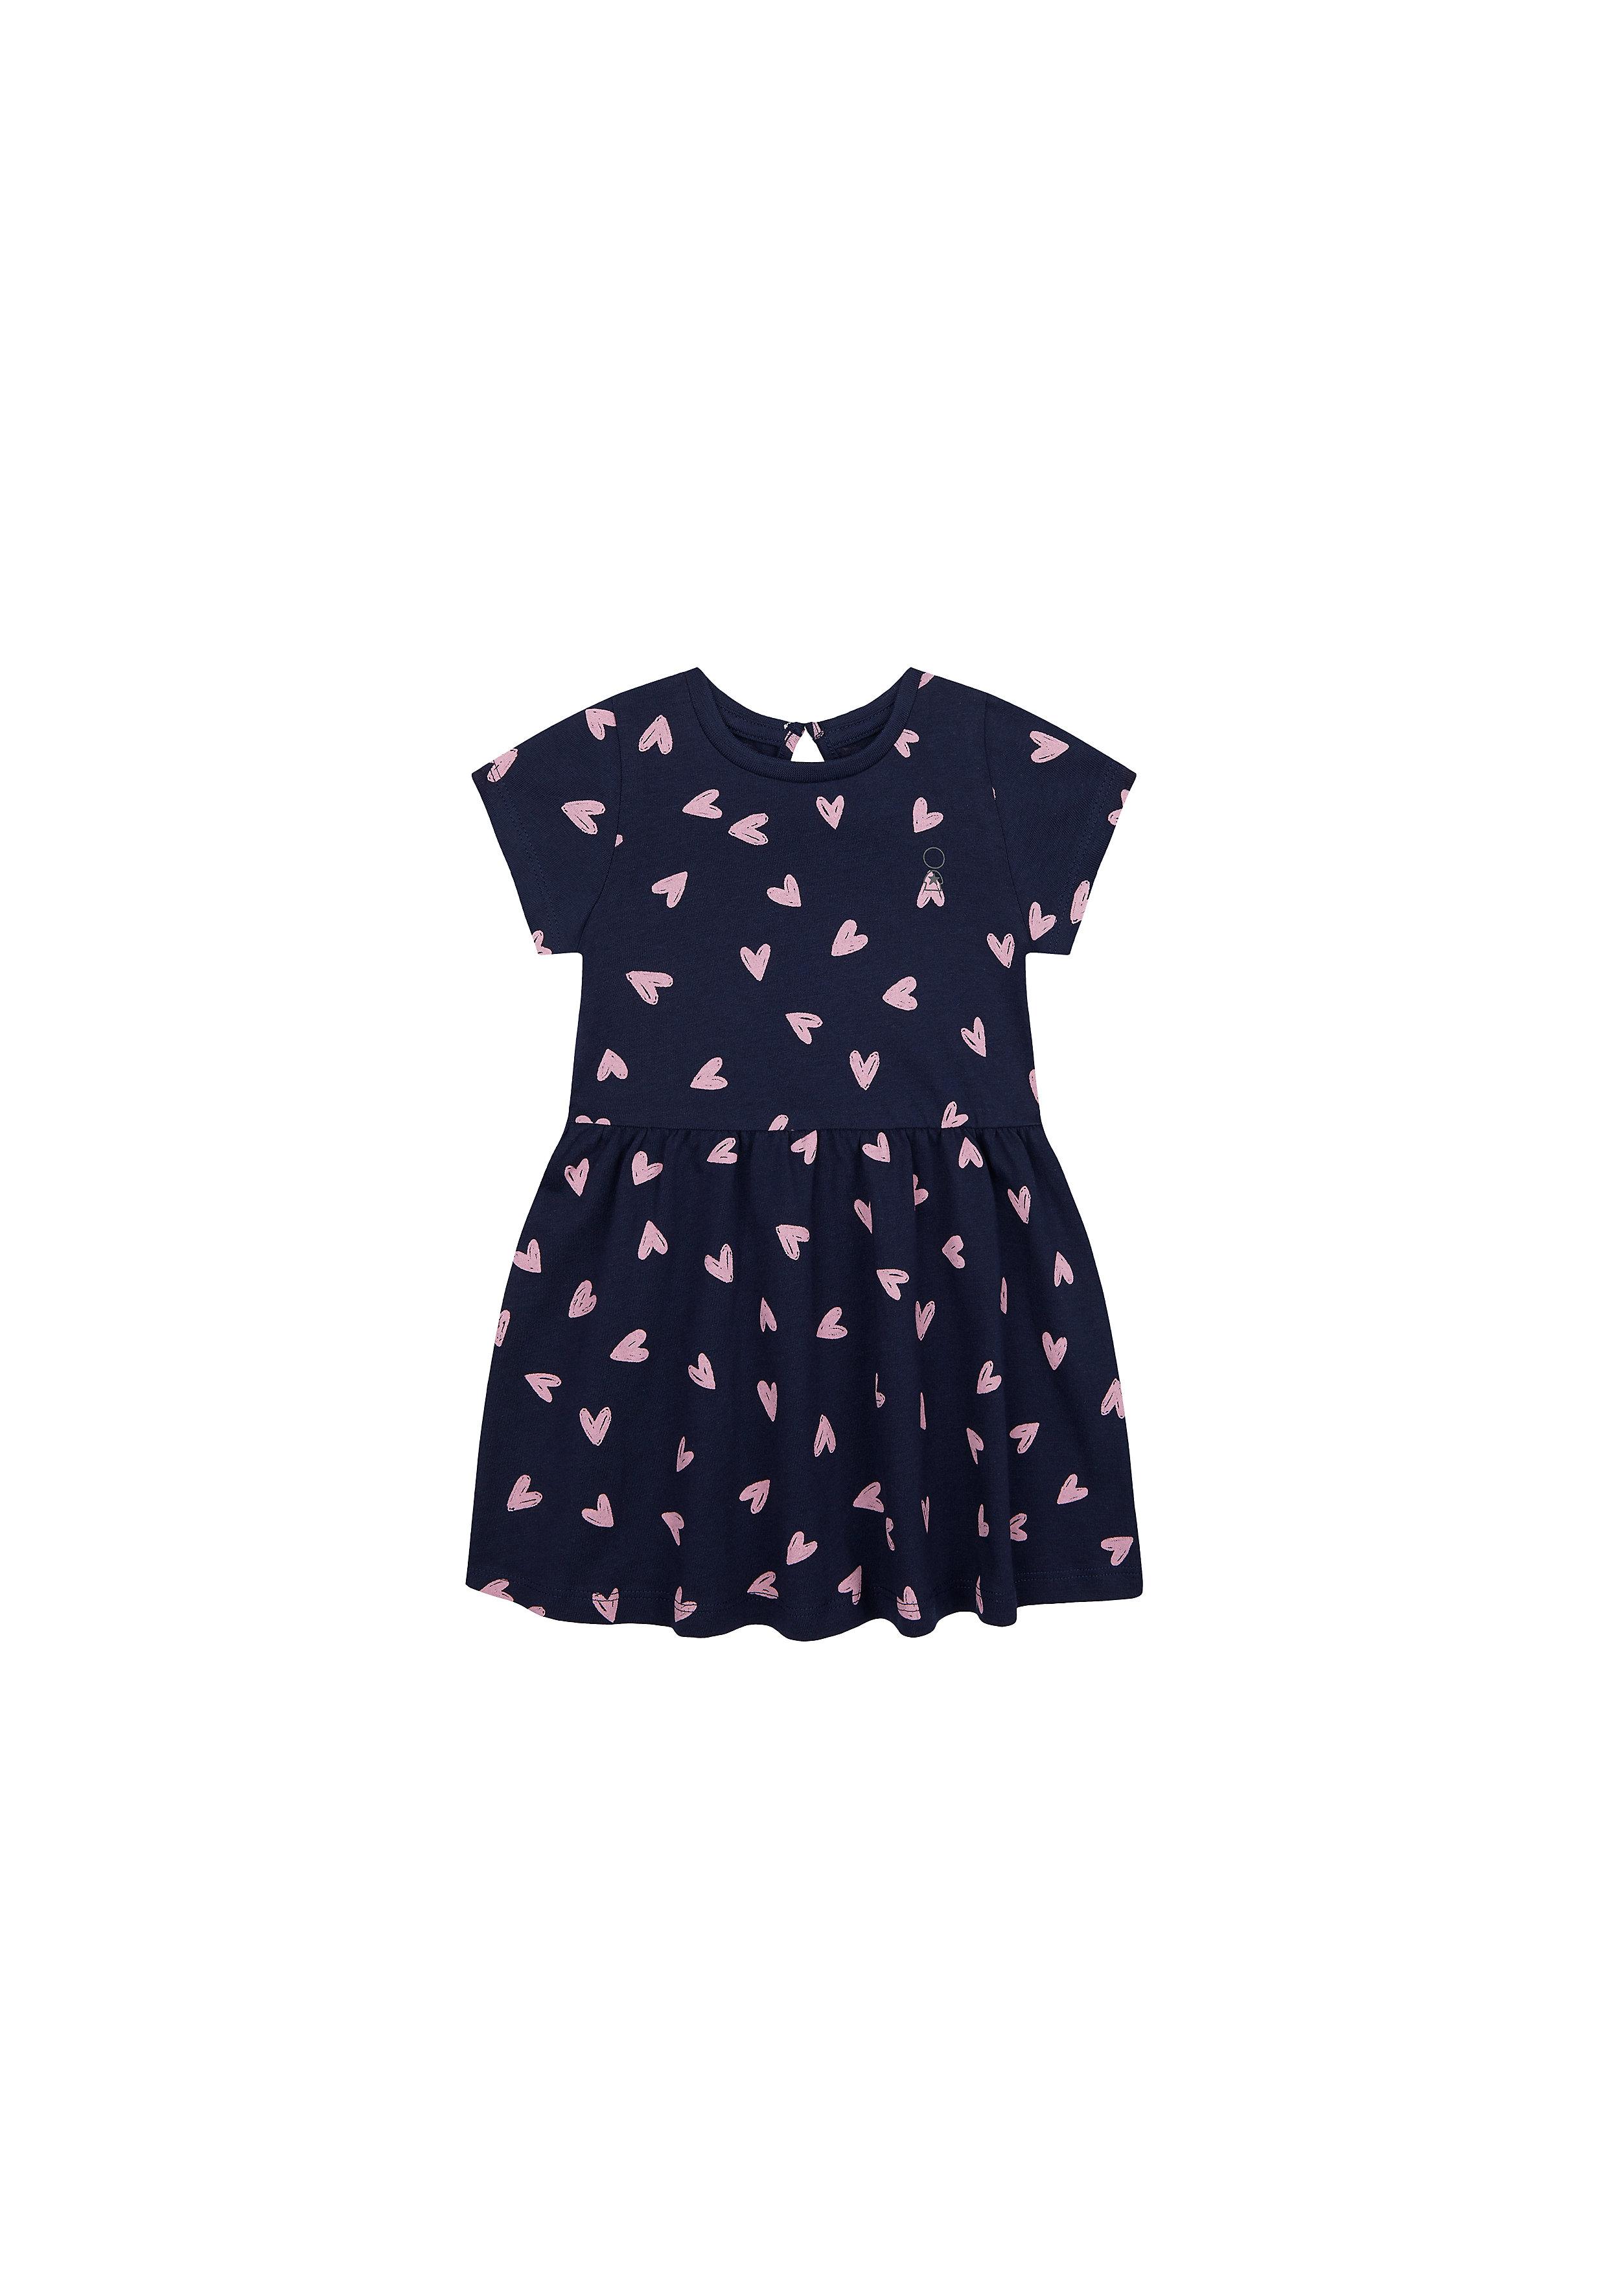 Mothercare | Girls Half Sleeves Dress Heart Print - Navy